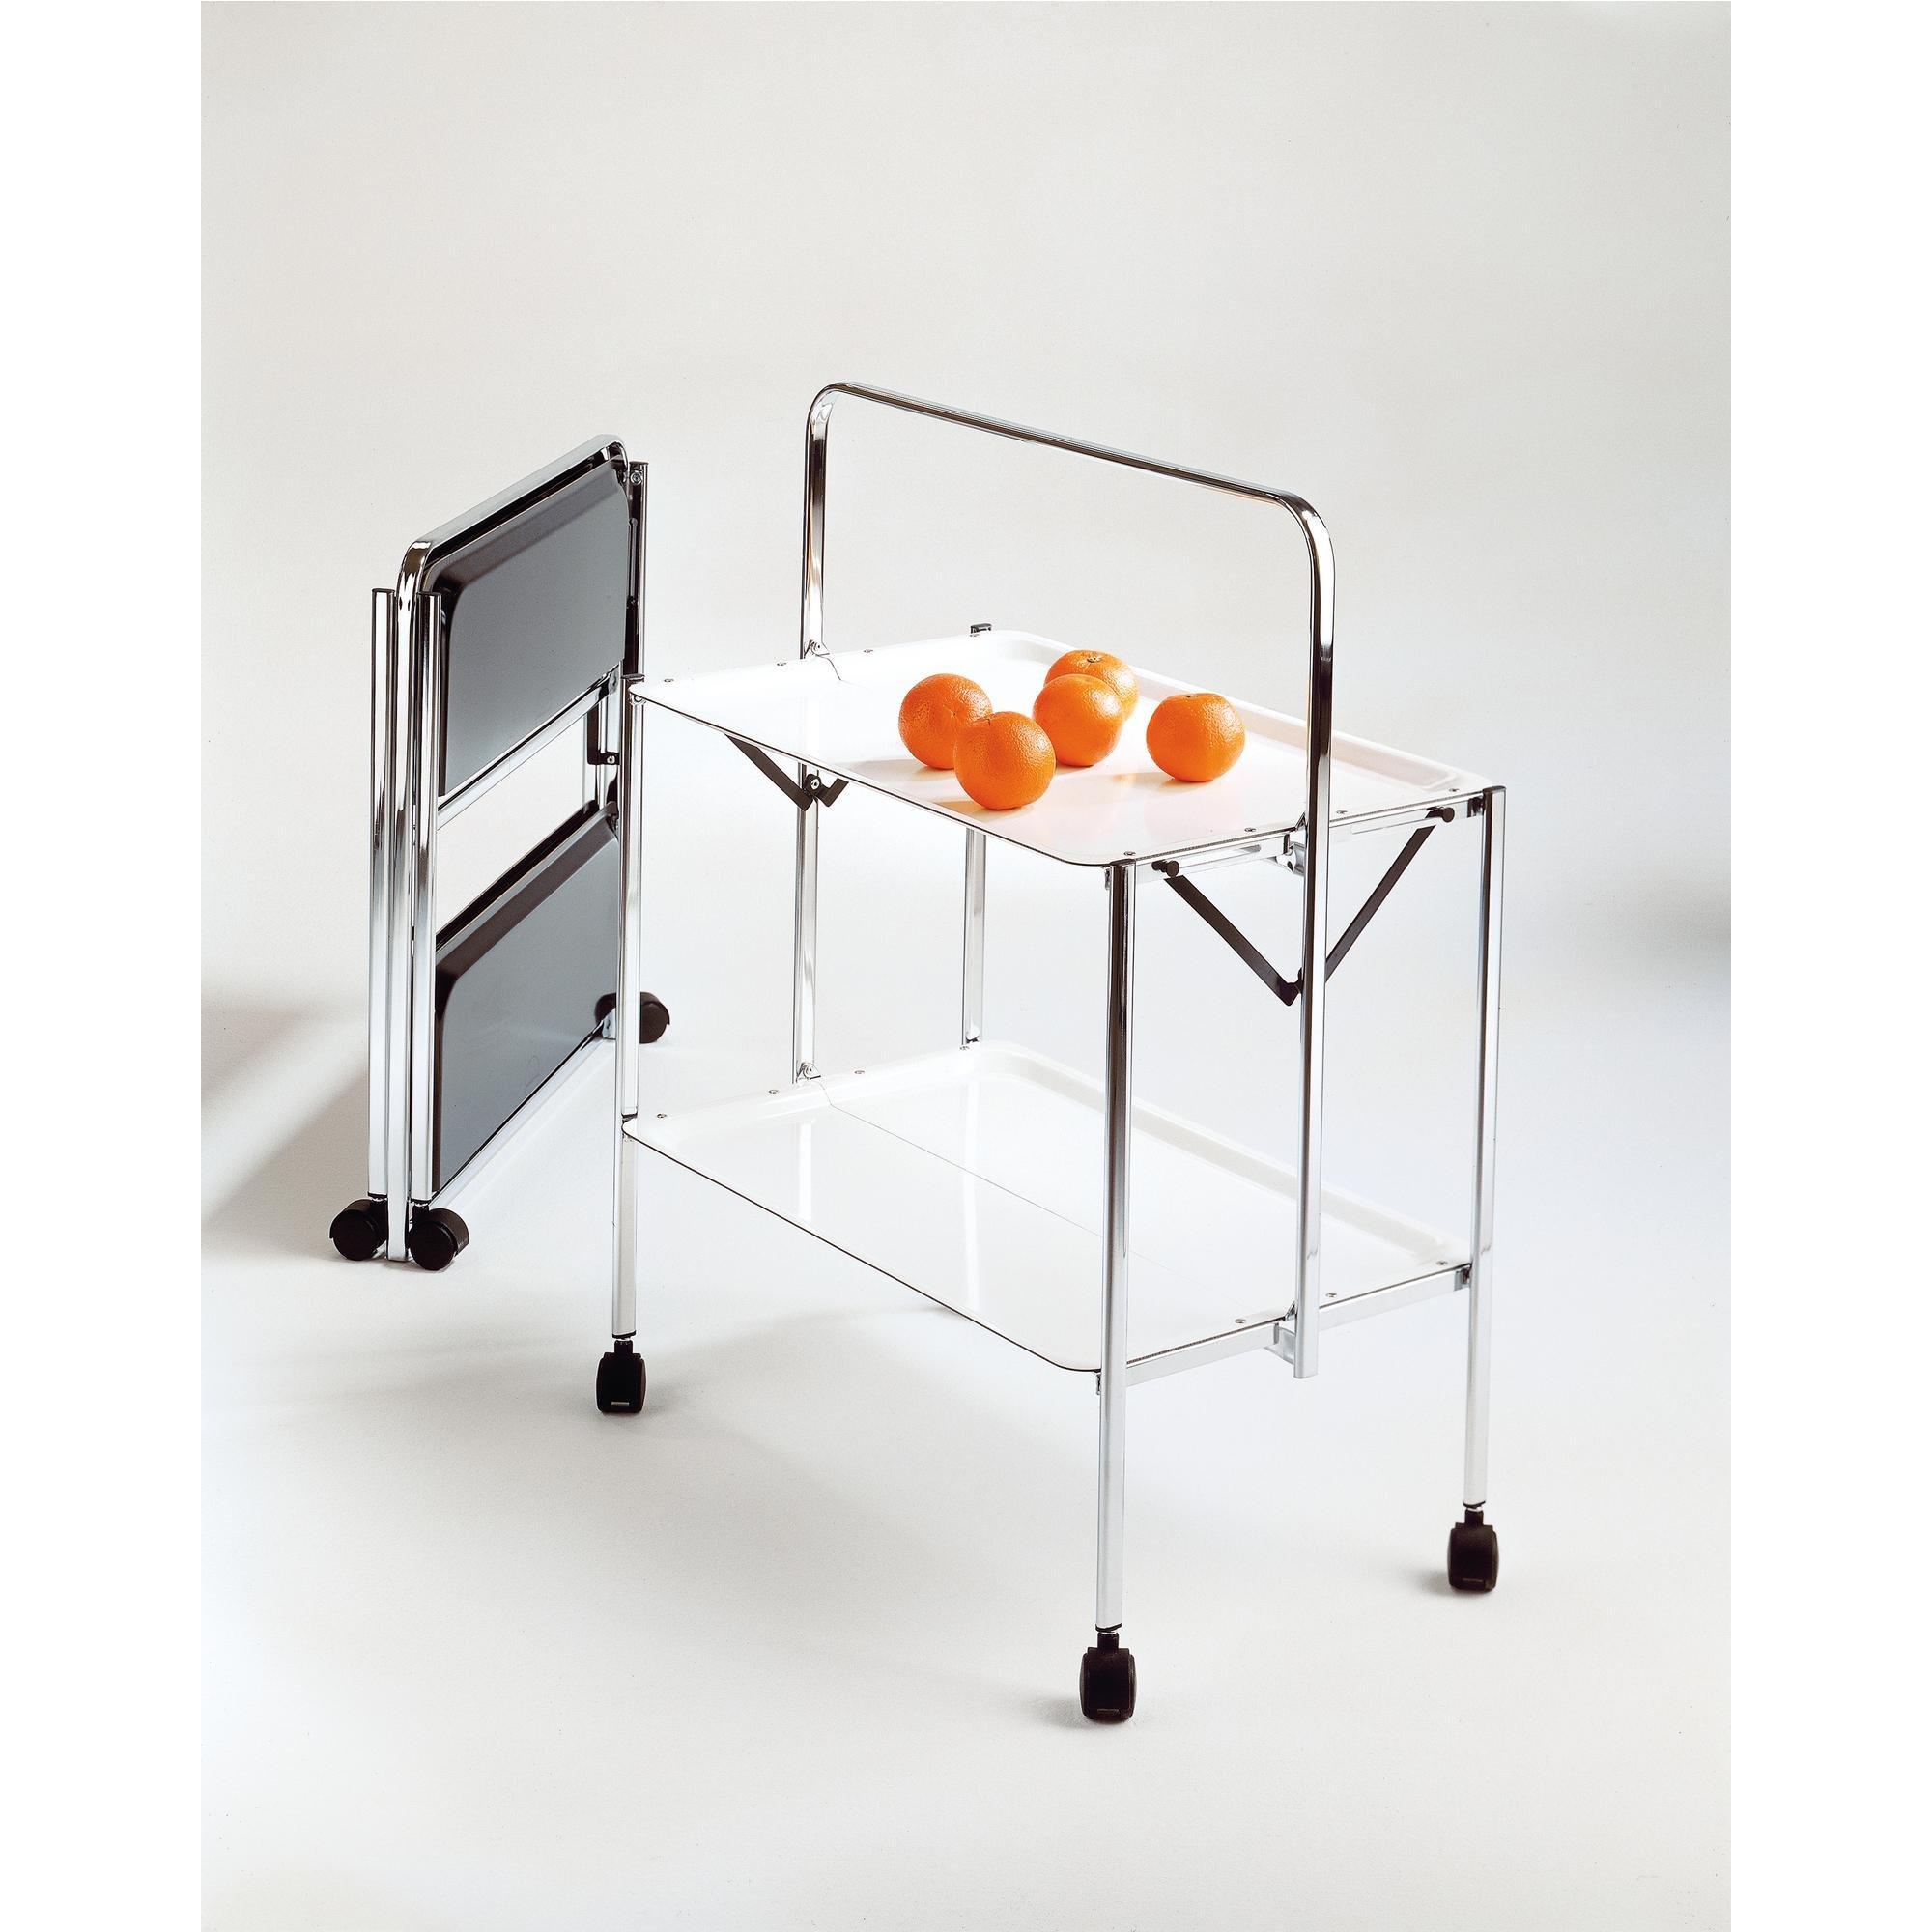 Mobili lavelli ikea carrelli portavivande - Carrelli per cucina ikea ...